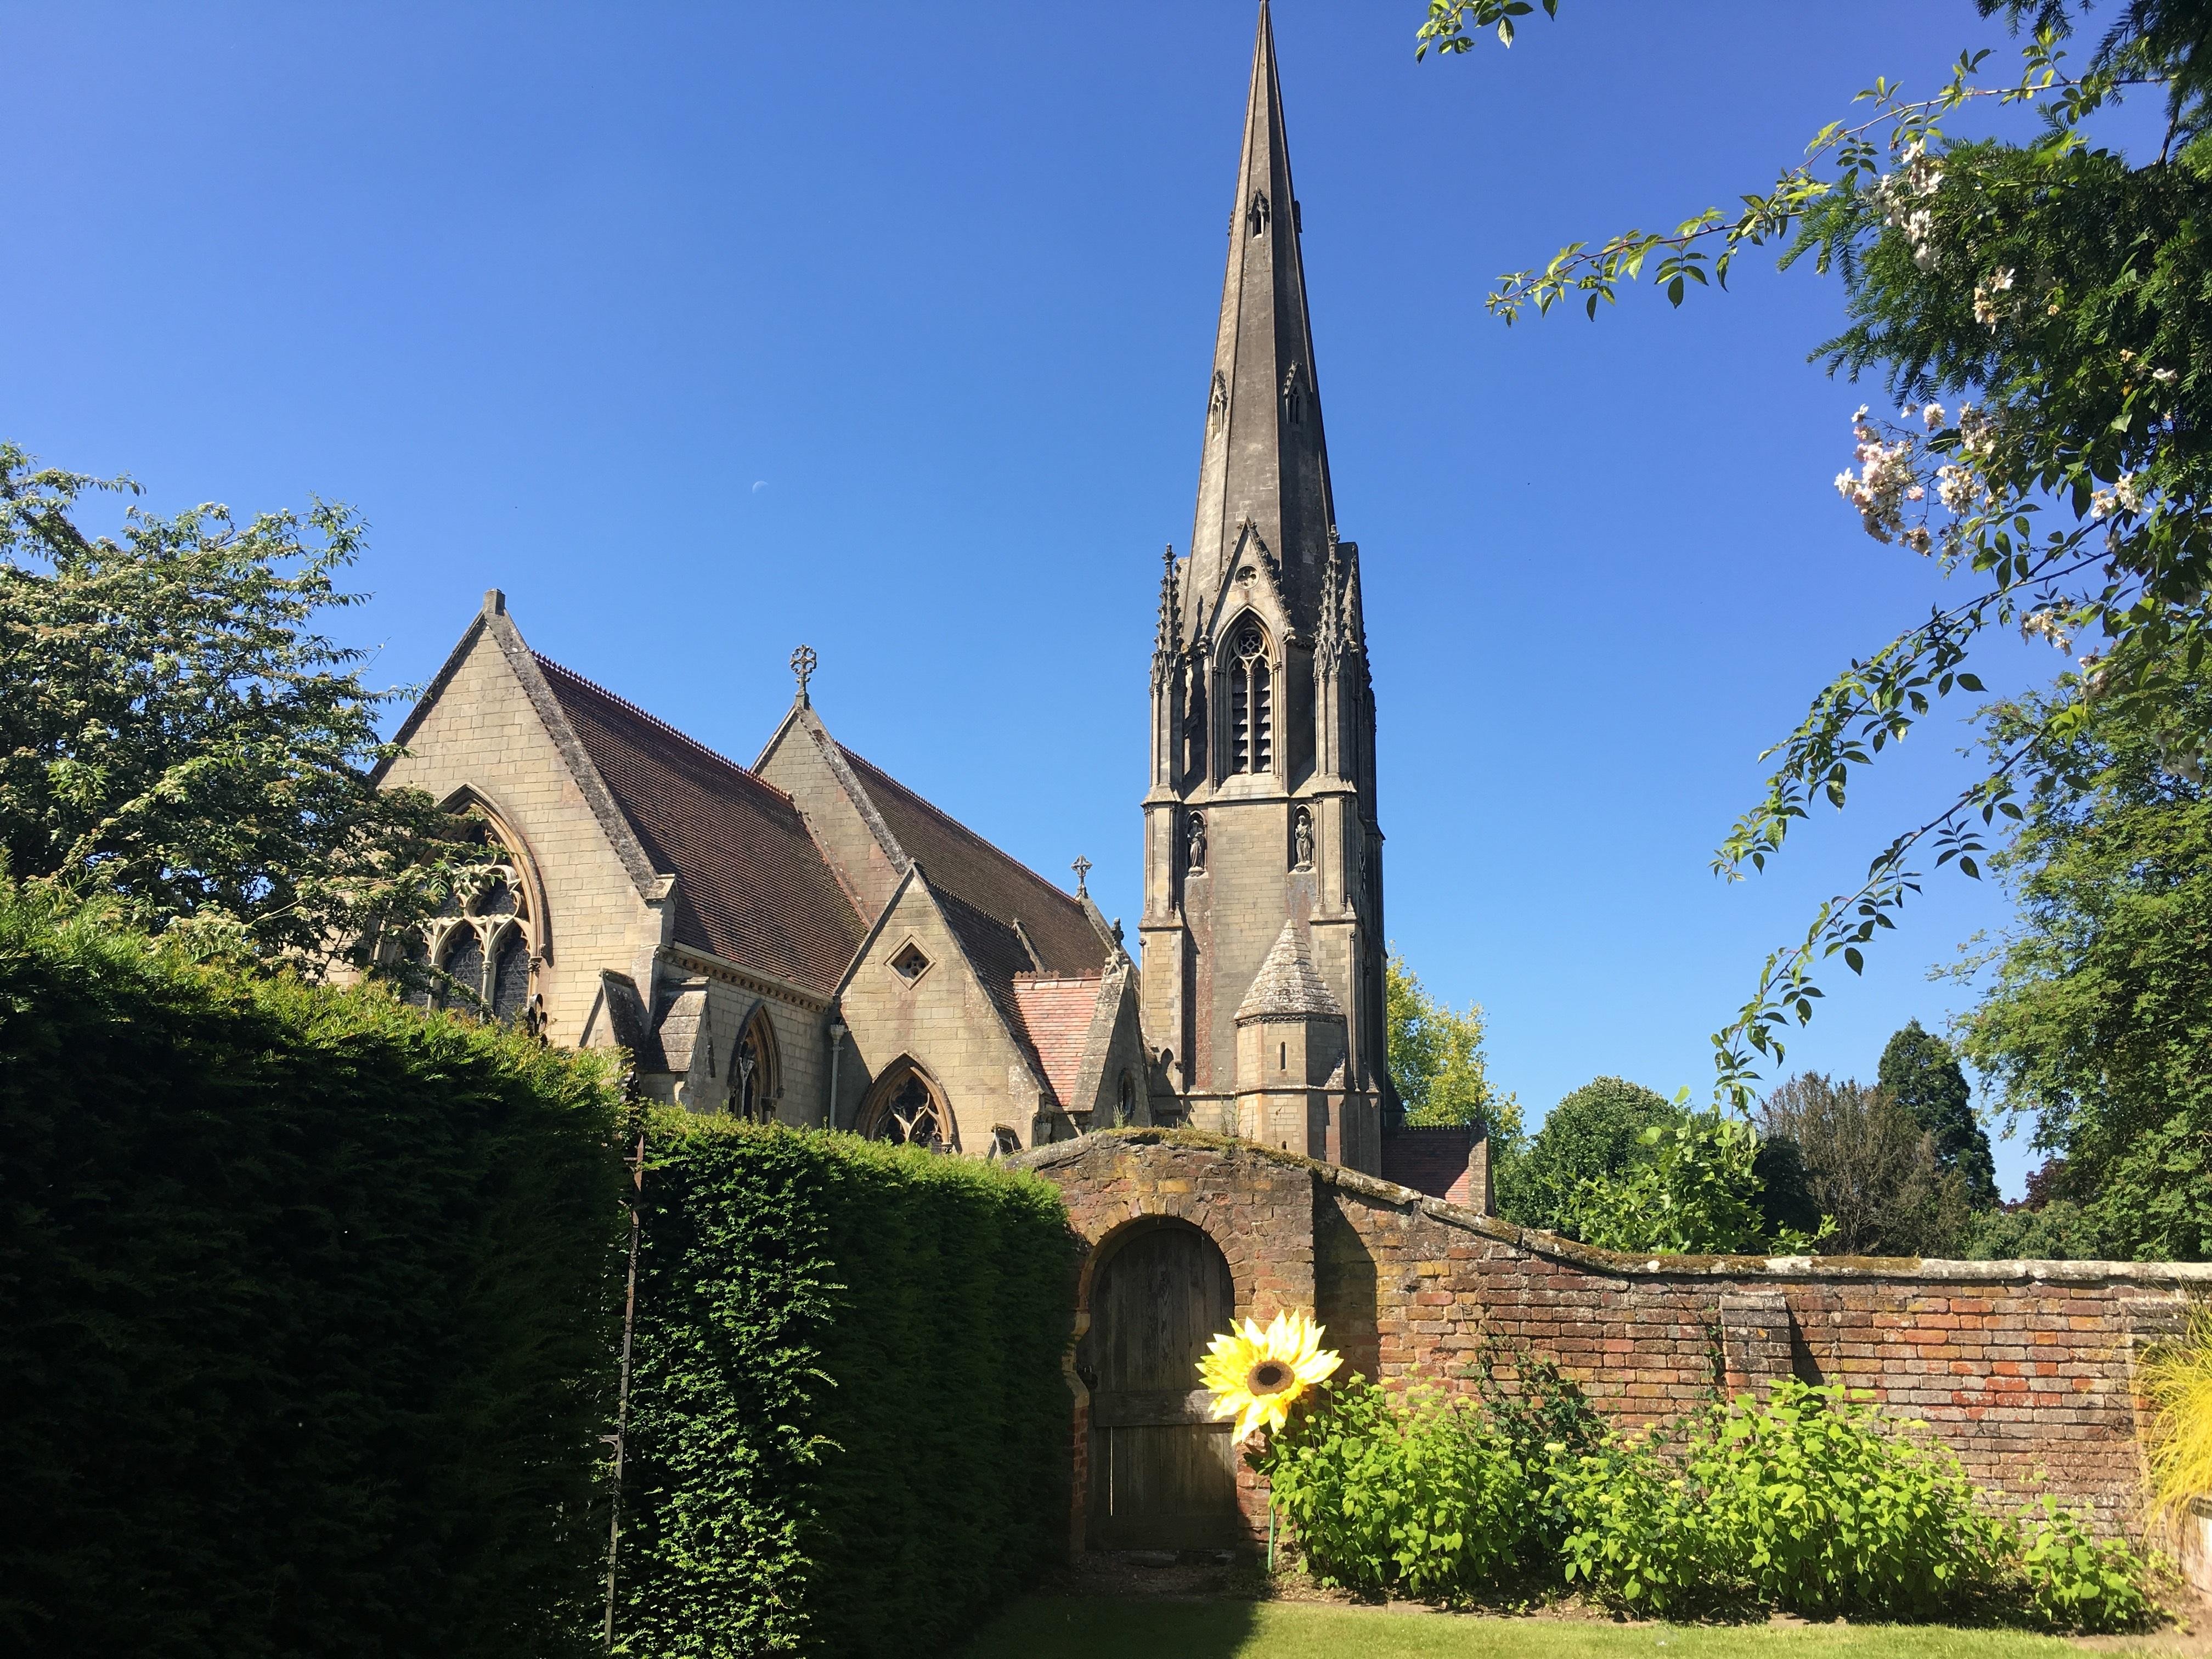 Shelbourne All Saints Church of England